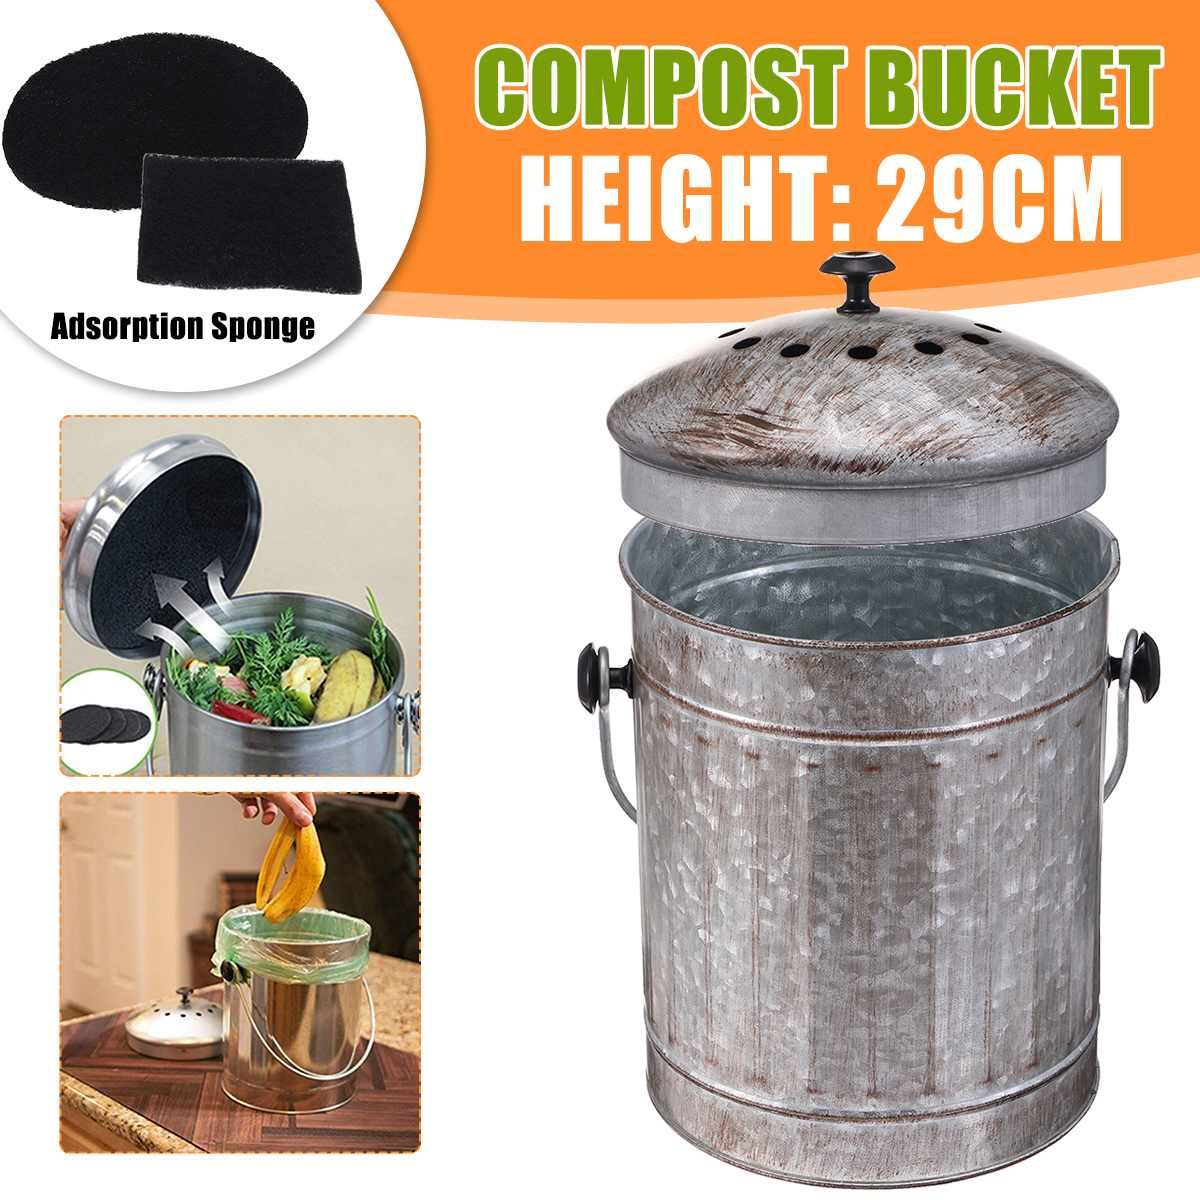 Cubo de Compost orgánico de desecho para jardín o cocina con 2 filtros de carbón